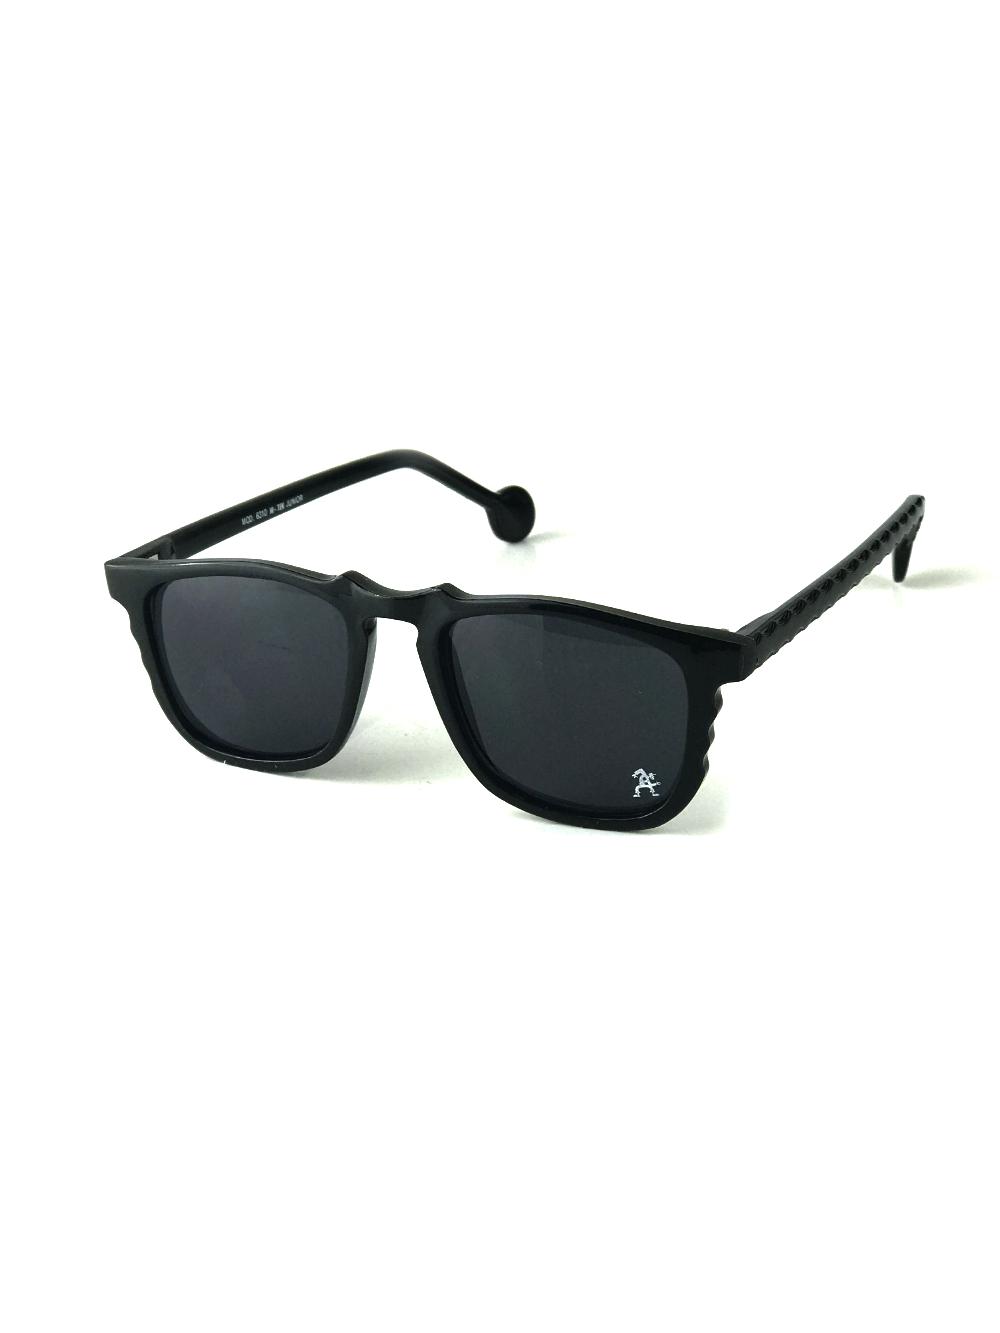 black square vintage retro sunglasses Wayfarer style mod6310 Hi Tek Junior